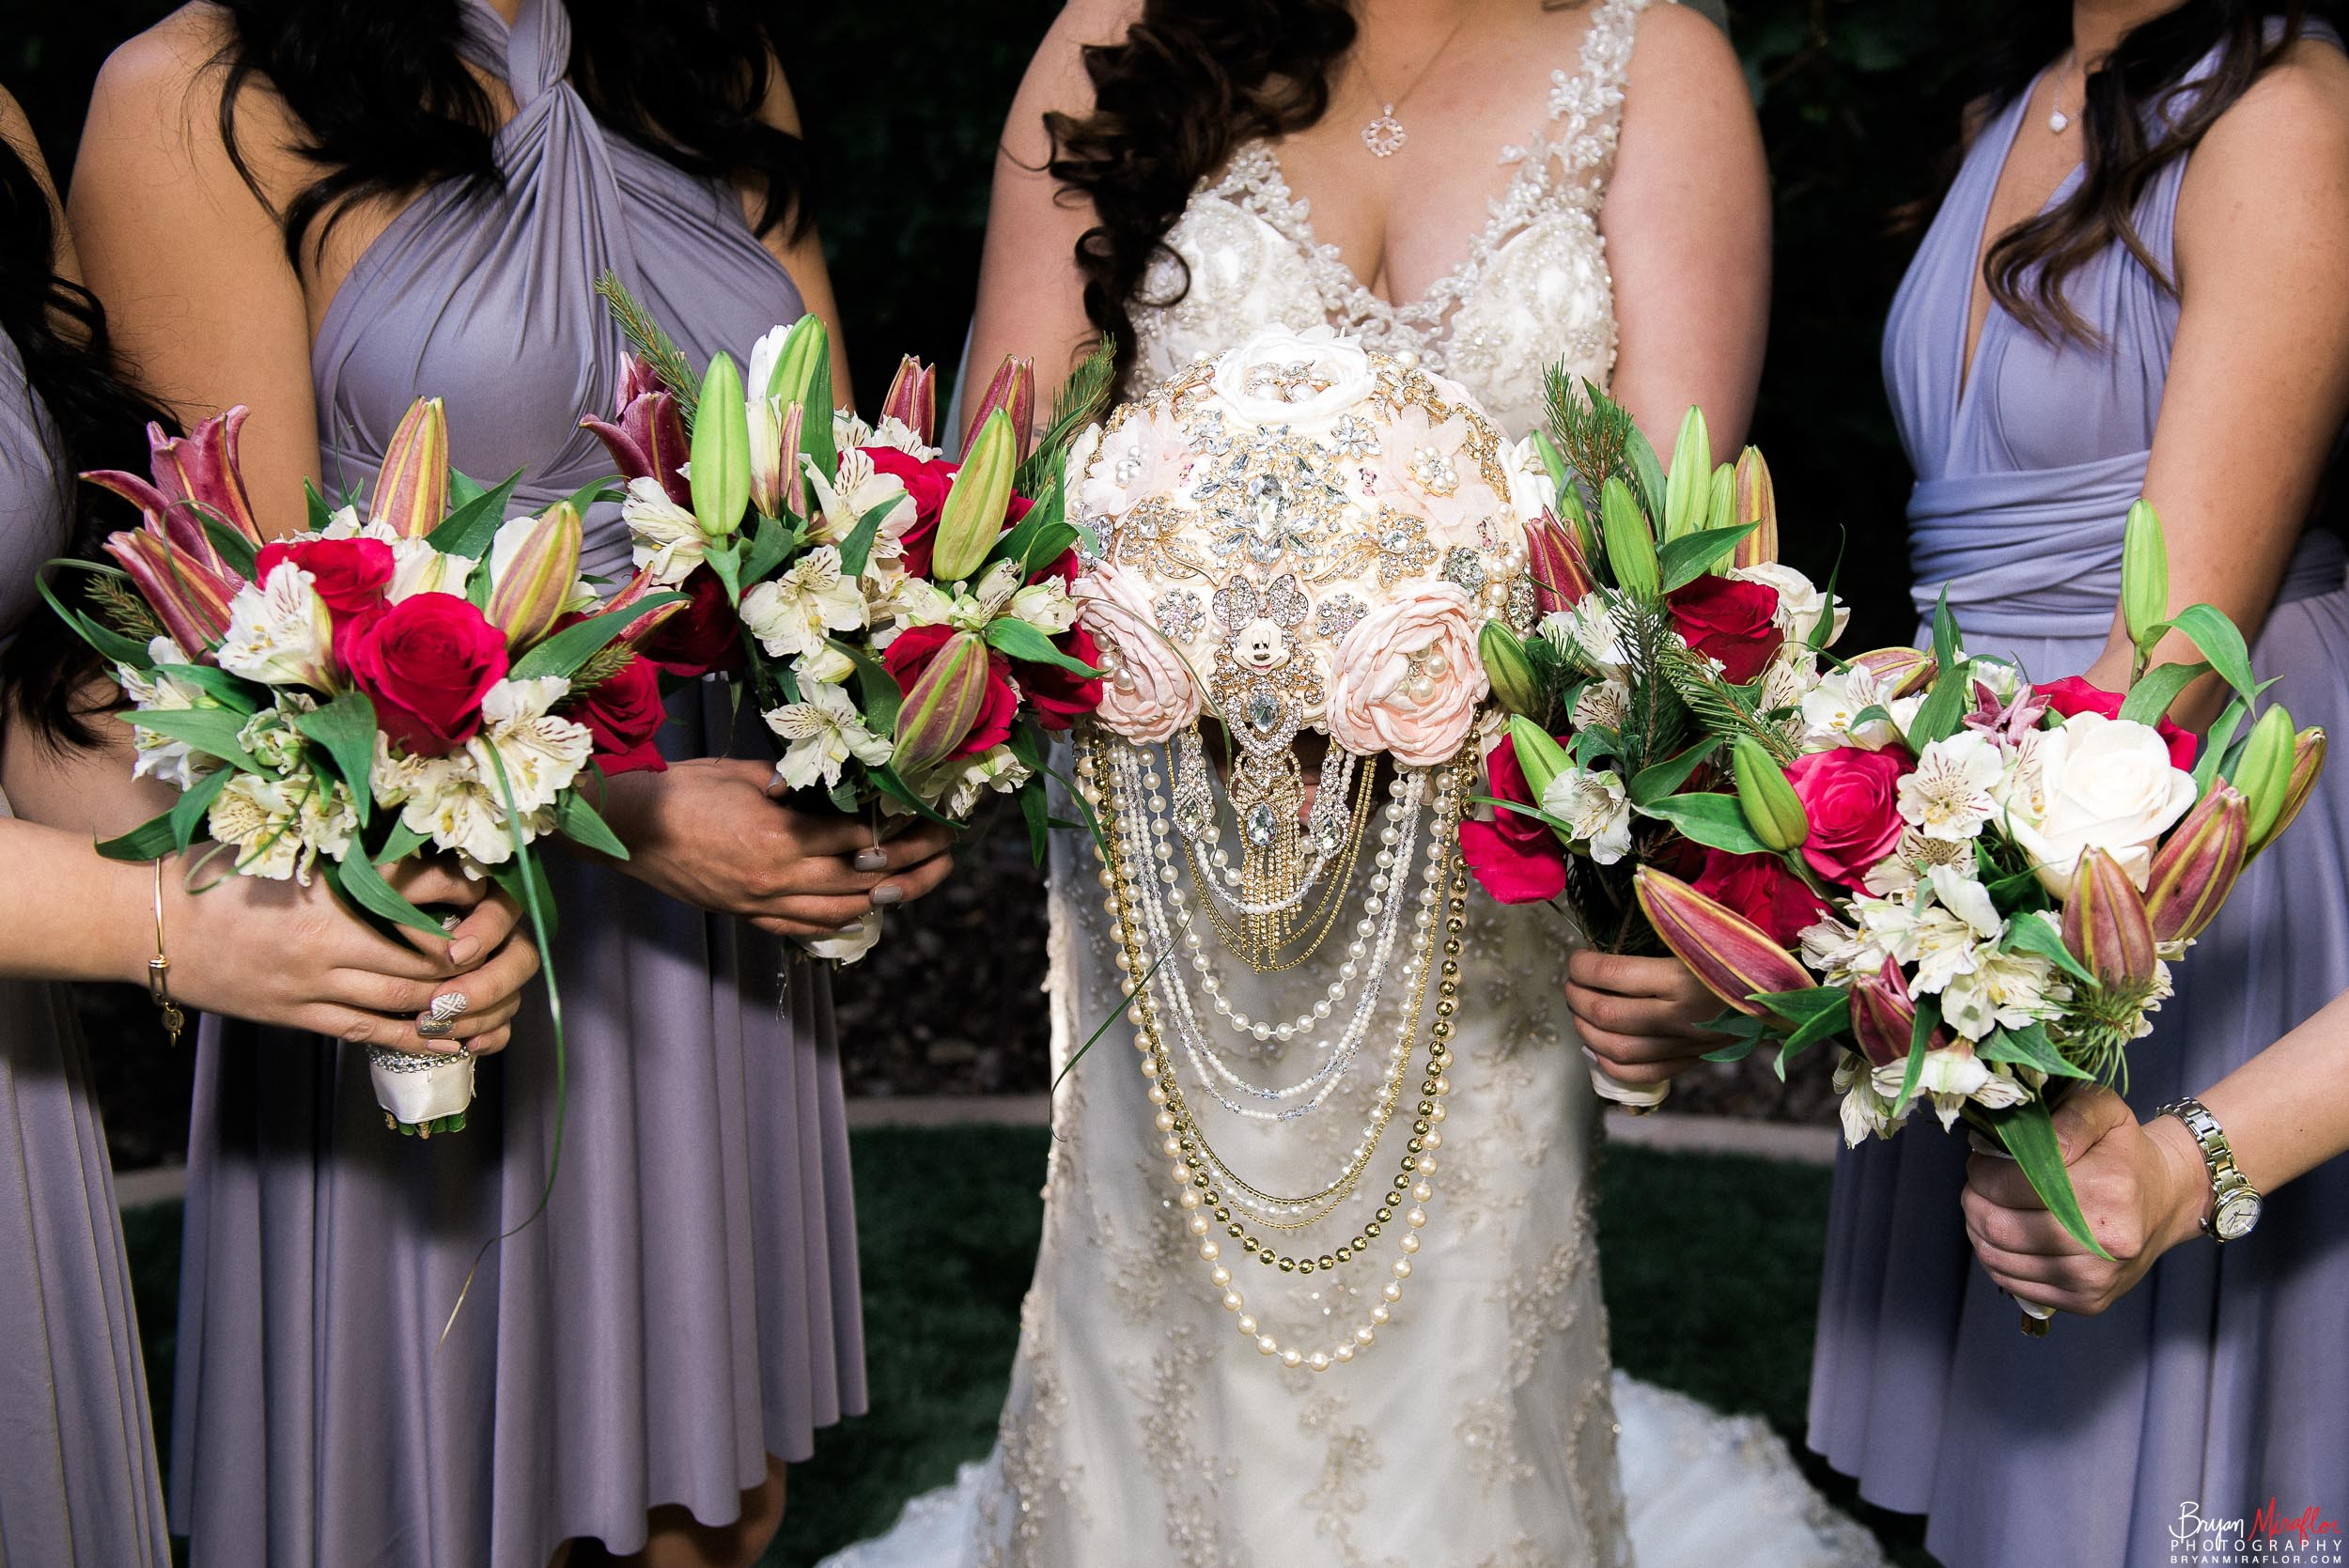 Bryan-Miraflor-Photography-Hannah-Jonathan-Married-Grand-Traditions-Estate-Gardens-Fallbrook-20171222-116.jpg